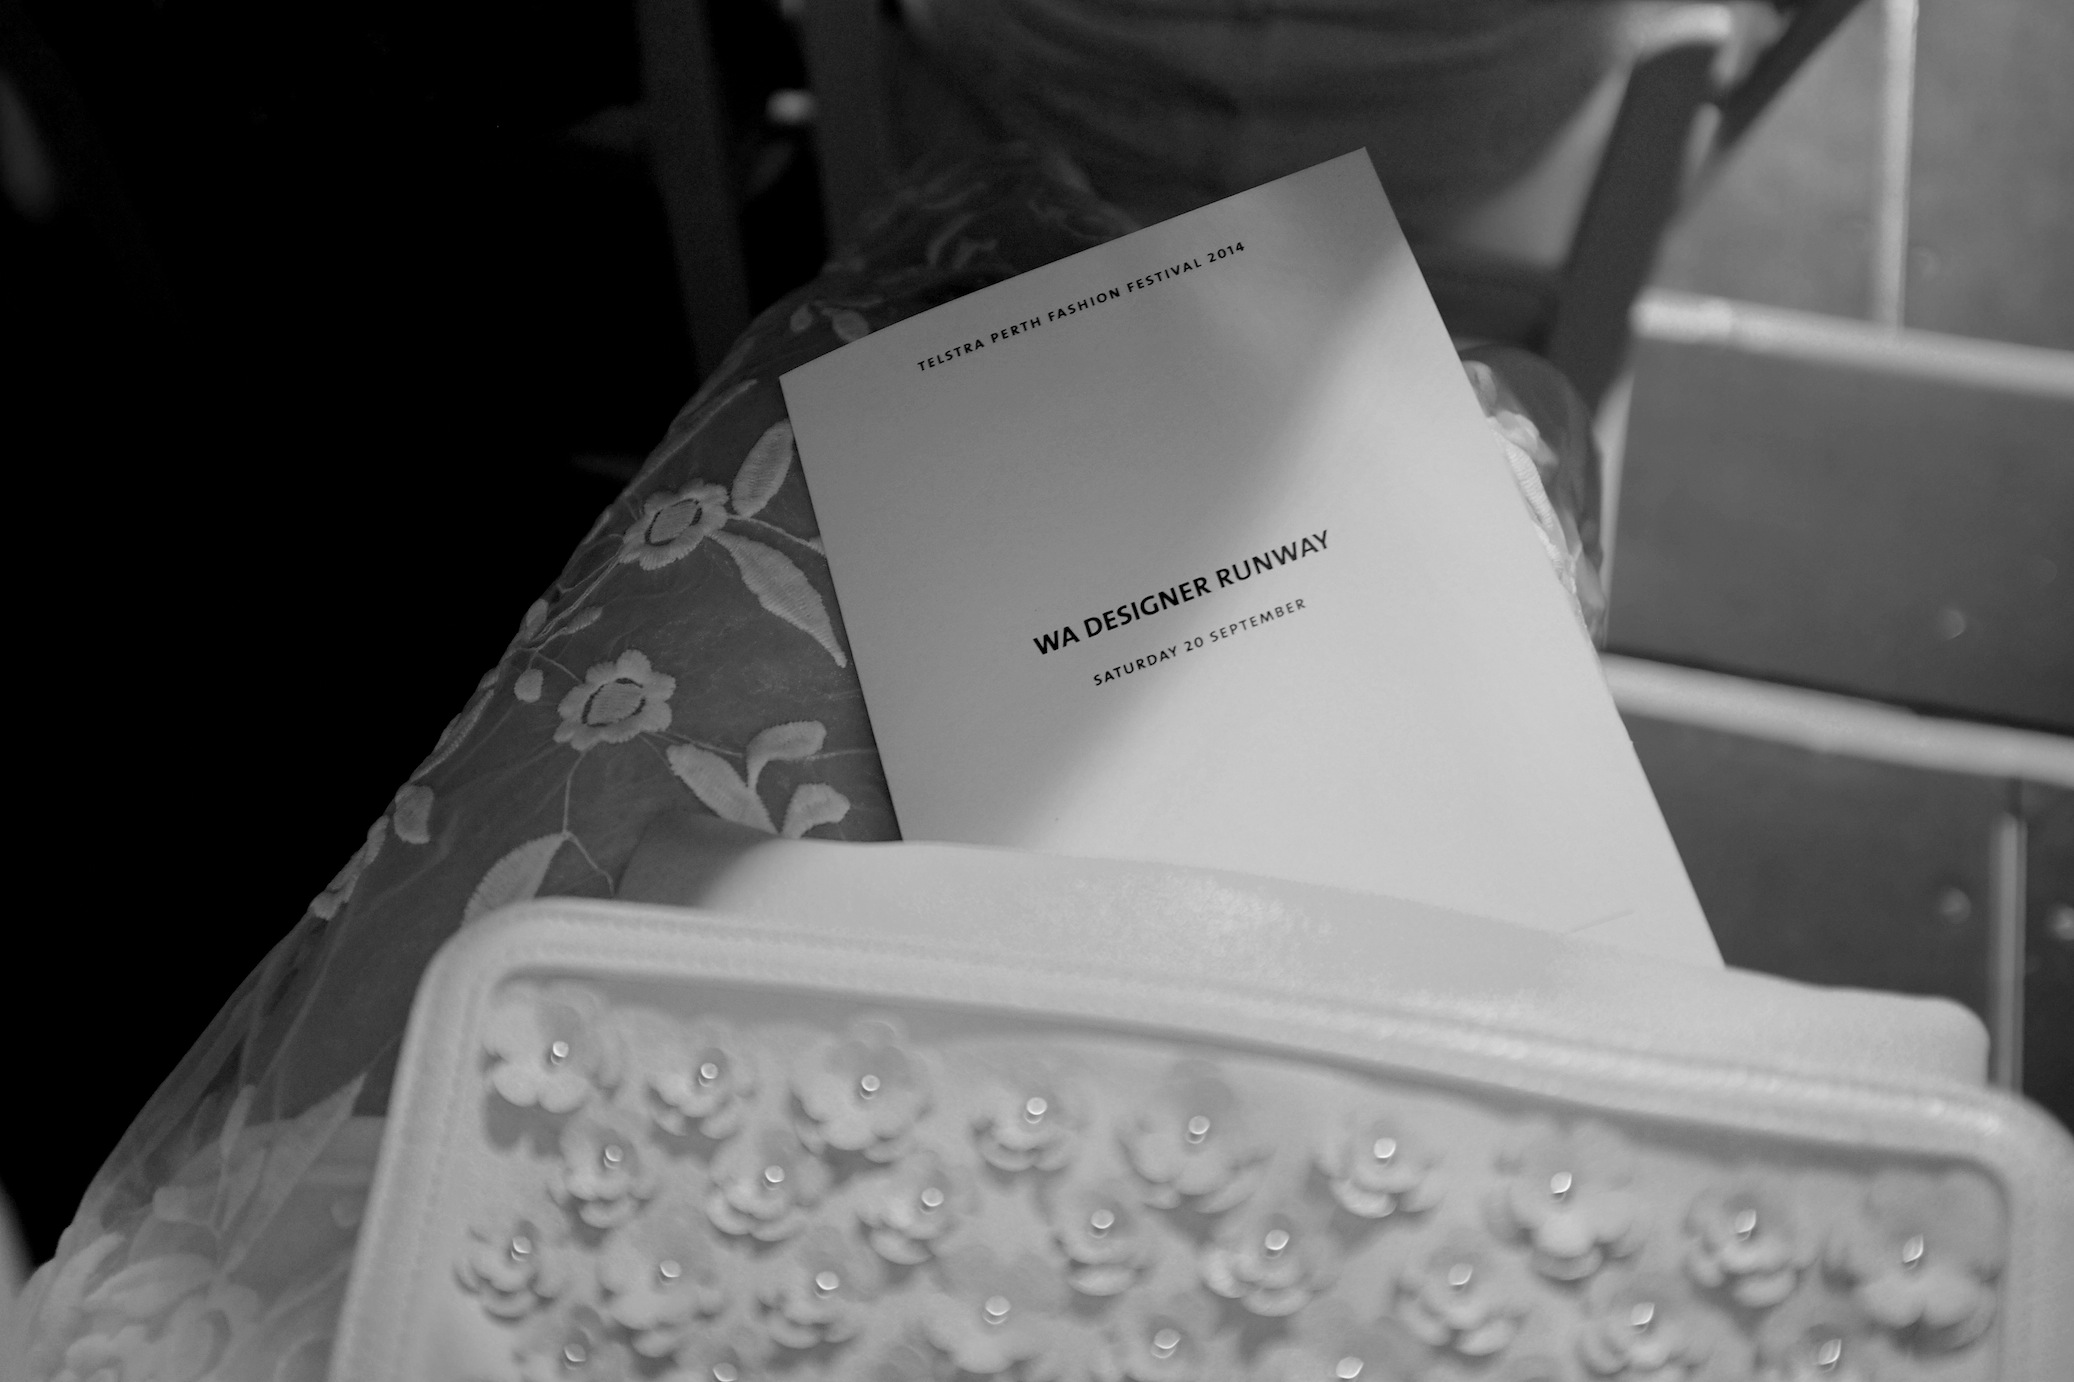 Bruug, TPFF, Natasha Butler, Wag, red carpet, Wild Horses, Betts shoes, heels, Fashion Paramount, Australian Designer, Blogger, catwalk, cute hats, fashion blog, Fashion photography, Fashion week, female fashion, get the look, hello parry, Jewellery, lovethread, midi skirt, Nezuki, Perth Blogger, Perth events, Perth Fashion, Perth fashion bloggers, Perth Fashion Festival, perth life, runway, skater style, sneakers, street look, street style, style, sunglasses, Telstra, Telstra Perth Fashion Festival, TPFF, trend